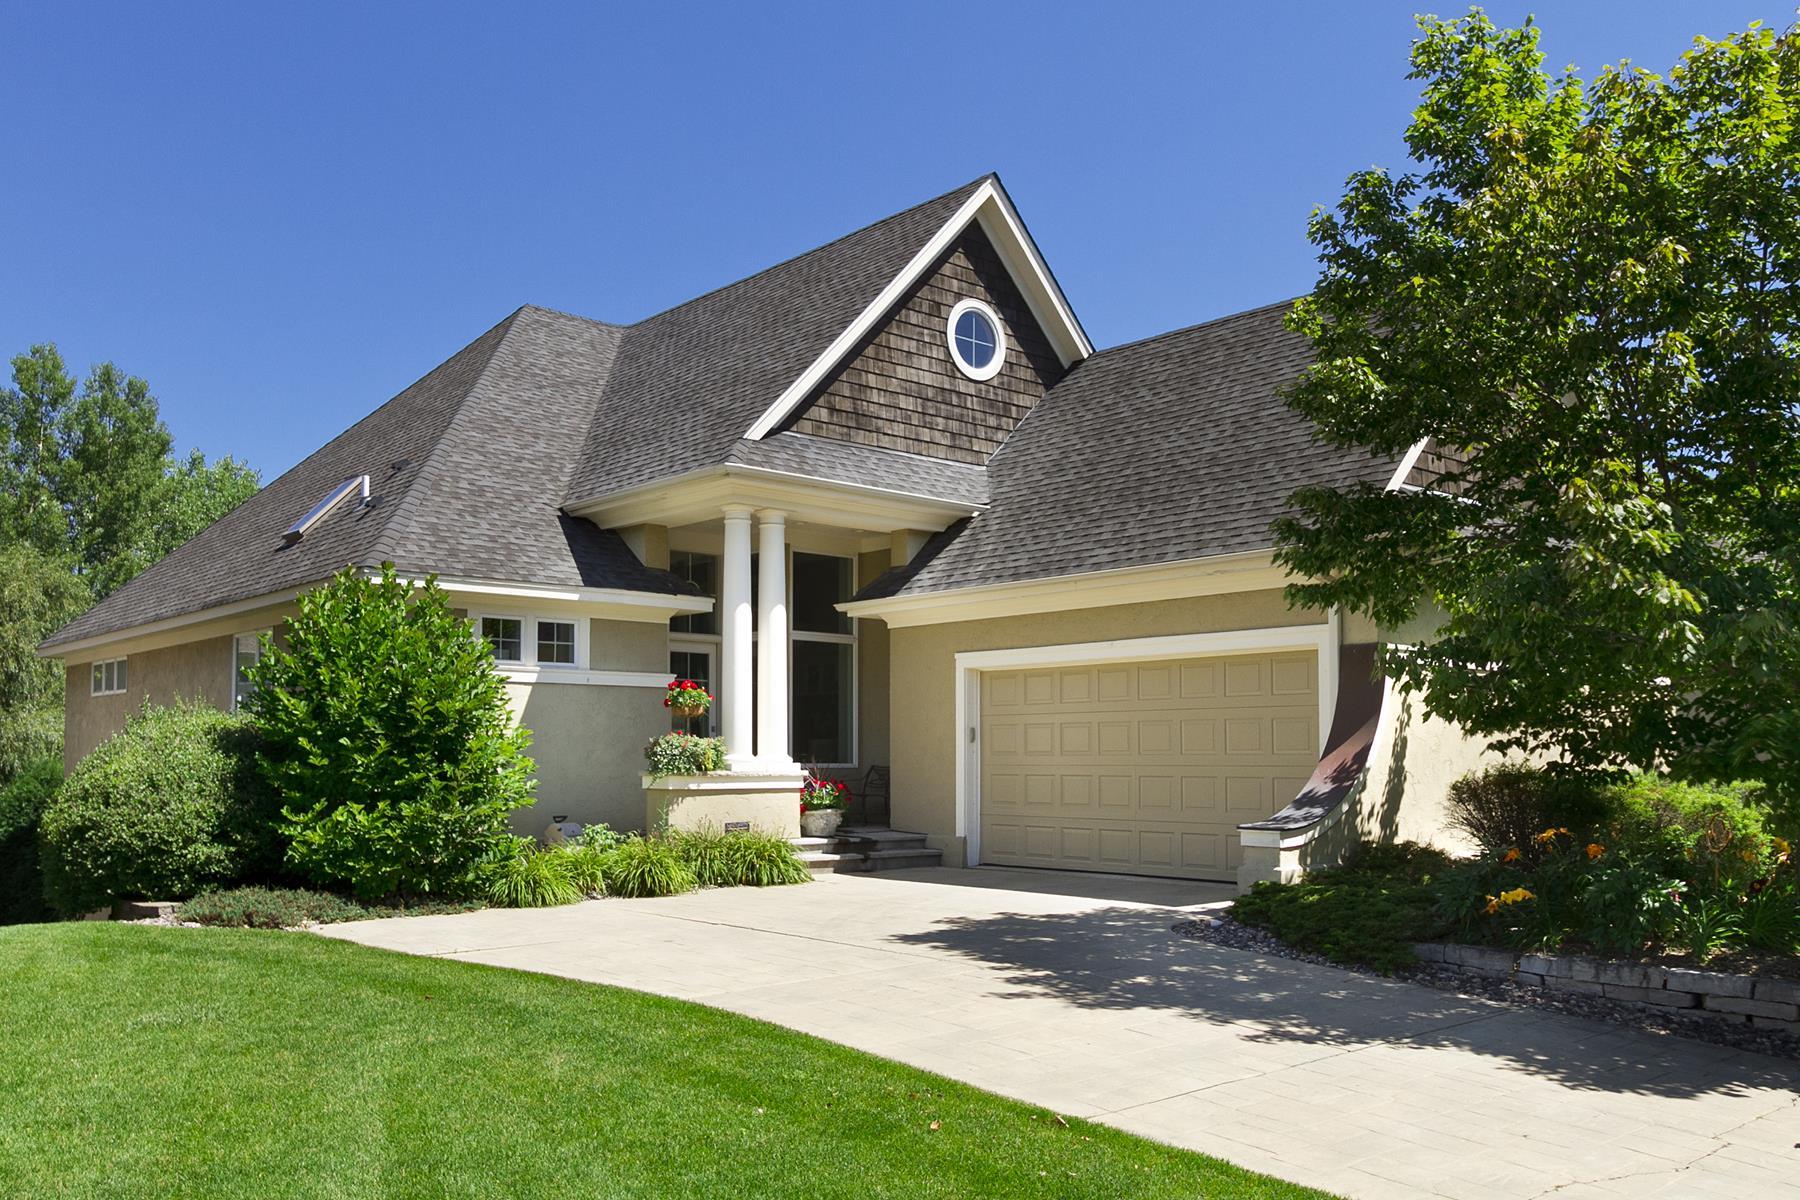 Single Family Home for Sale at 5820 Vernon Lane Edina, Minnesota 55436 United States